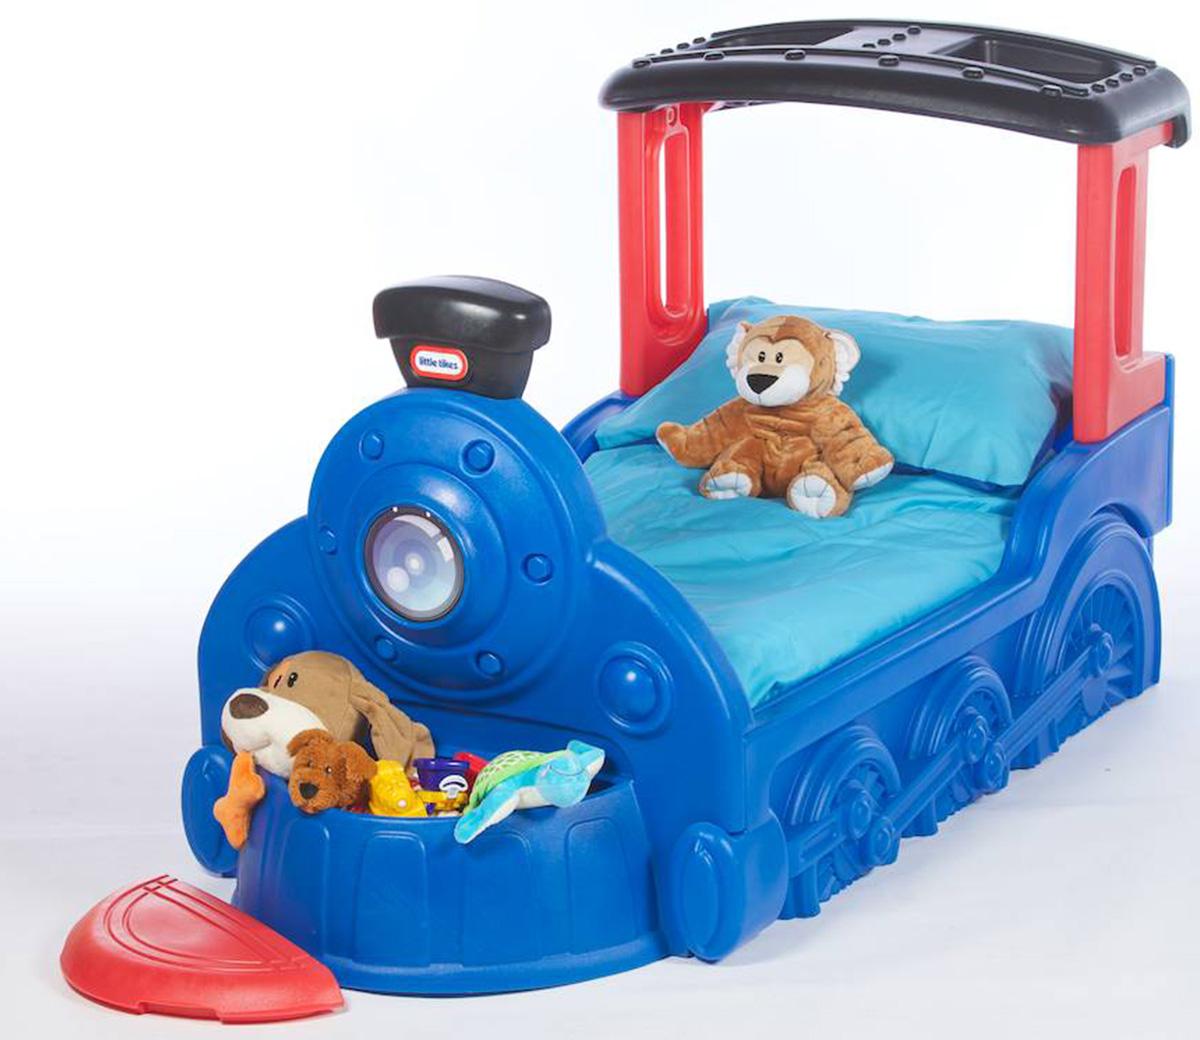 4d8669d5d08a Sleepy Choo Choo Toddler Bed